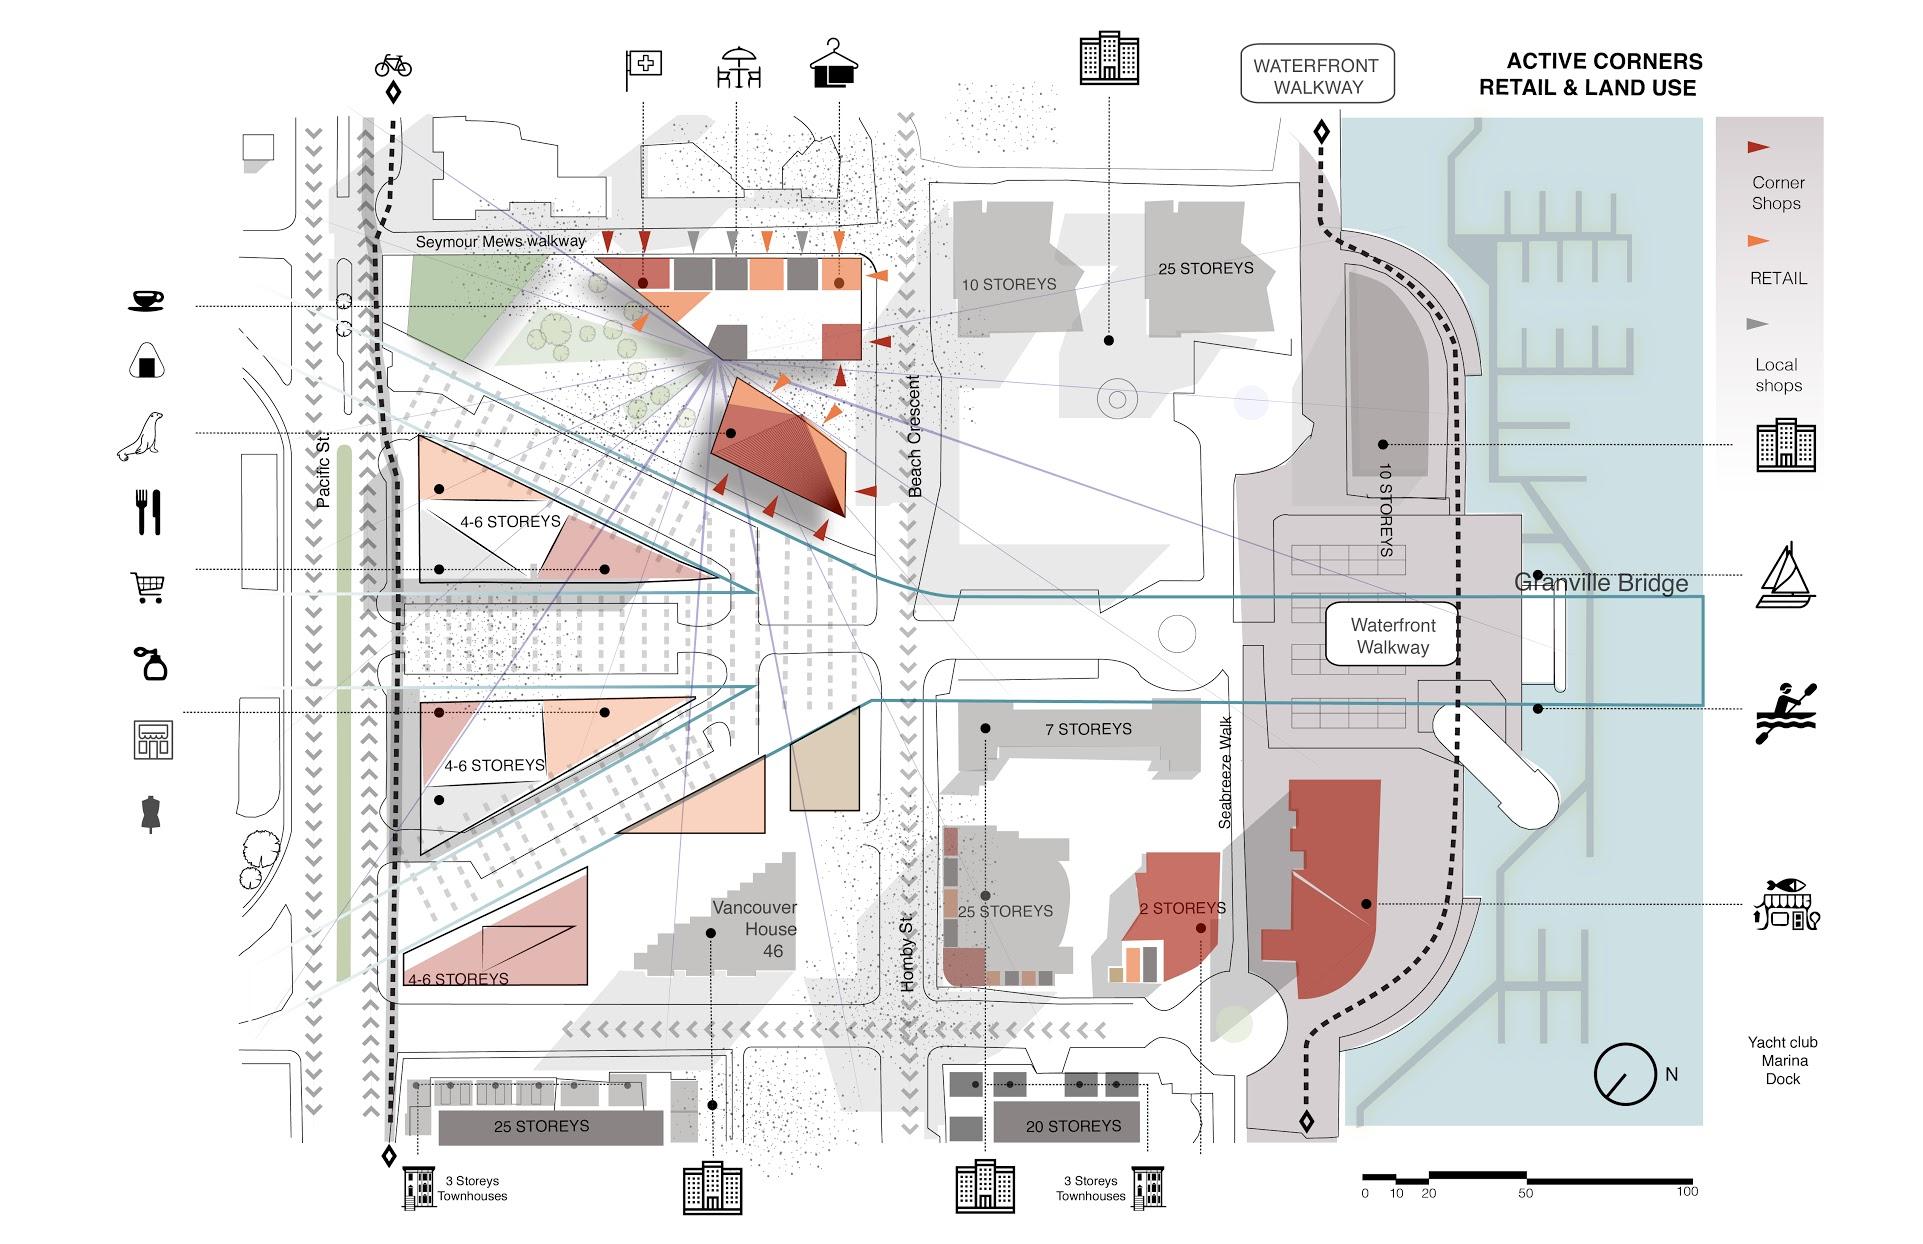 Active Corners, retail & land use